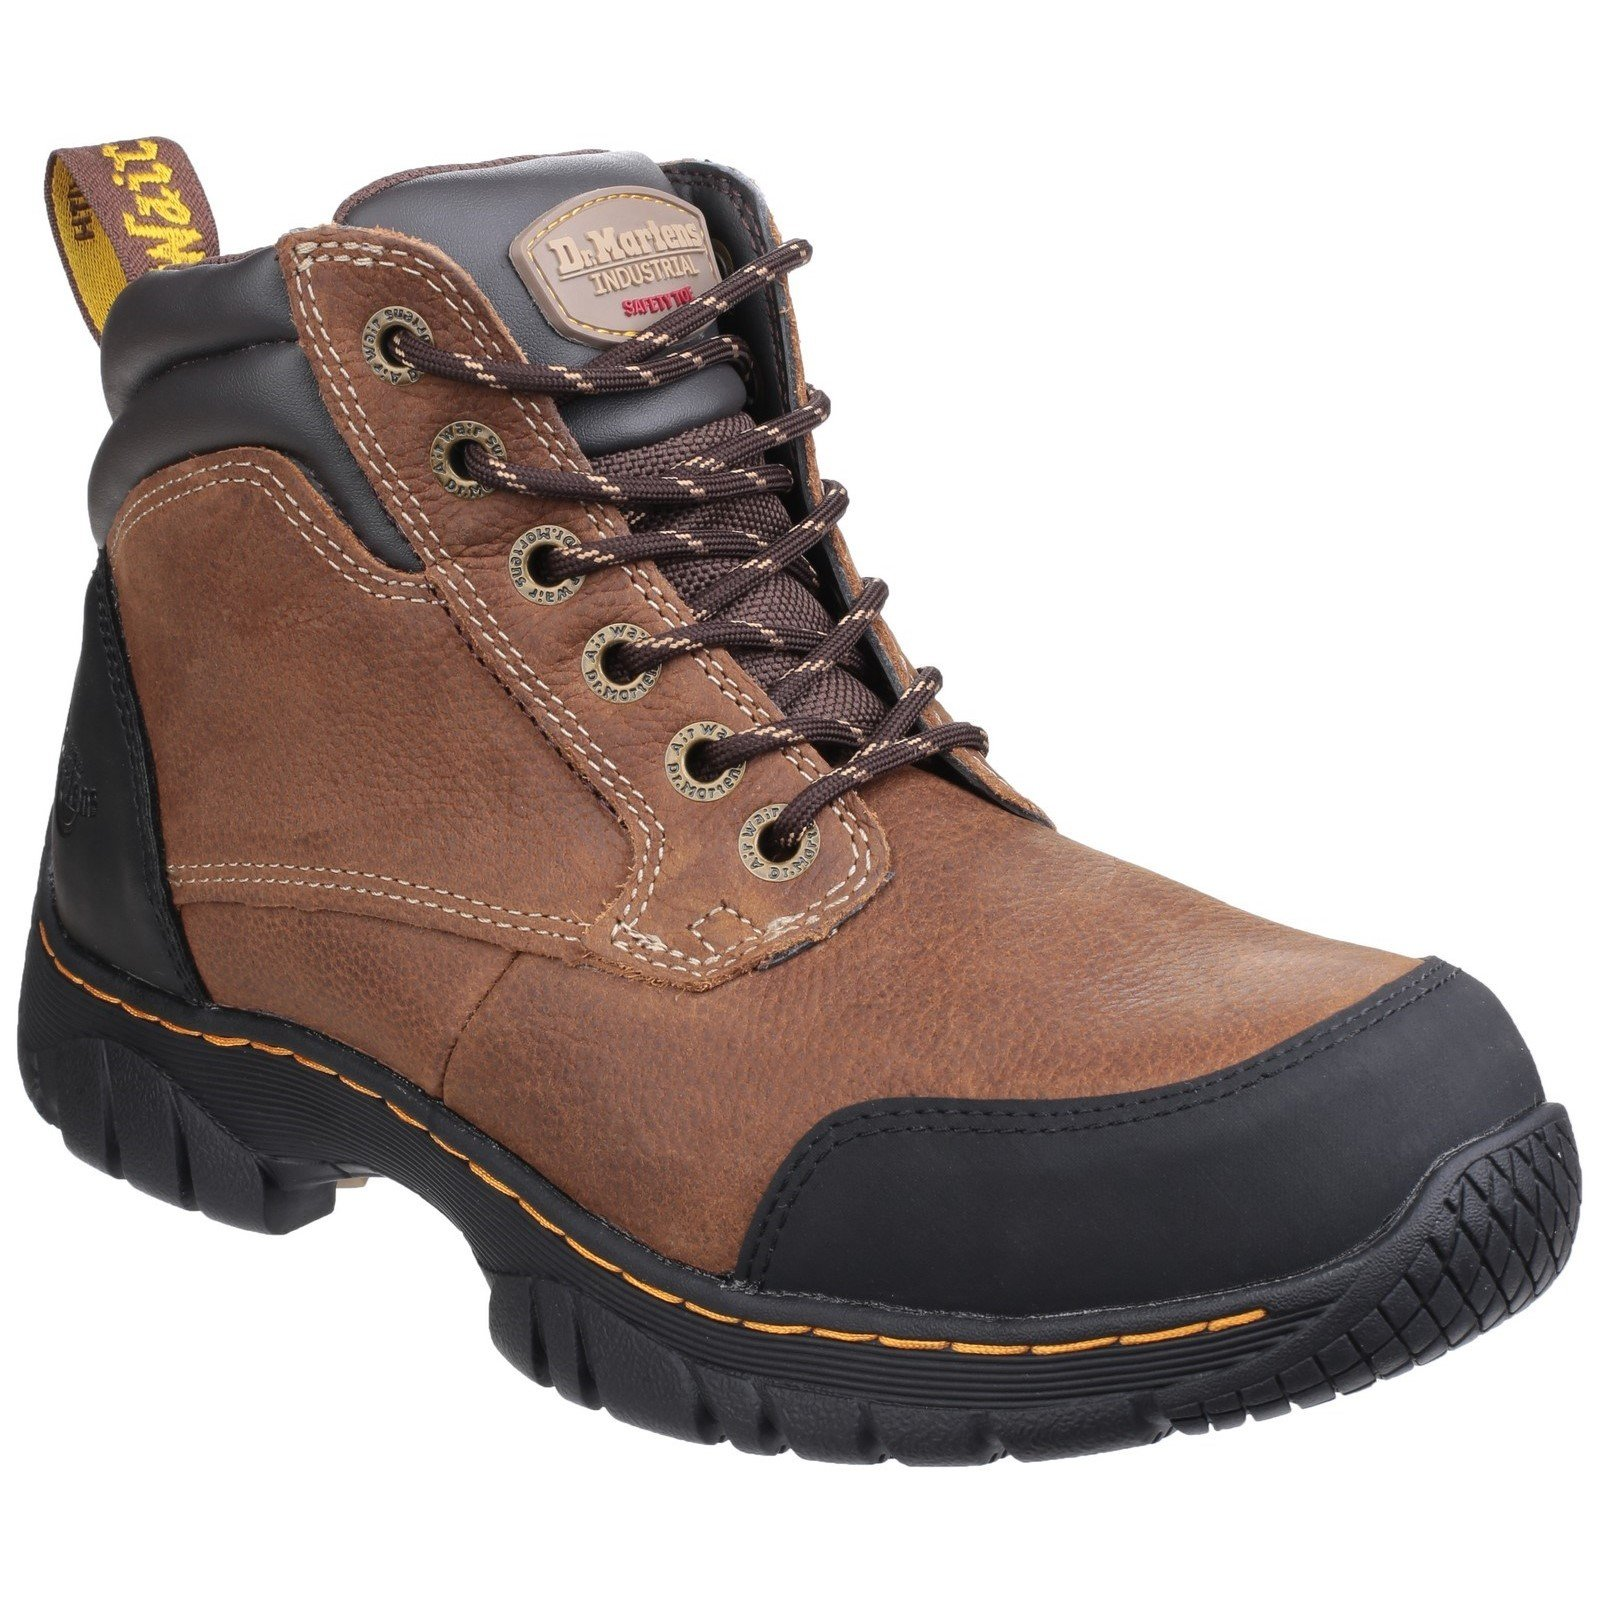 Dr Martens Unisex Riverton SB Lace up Hiker Safety Boot 24534 - Brown 3